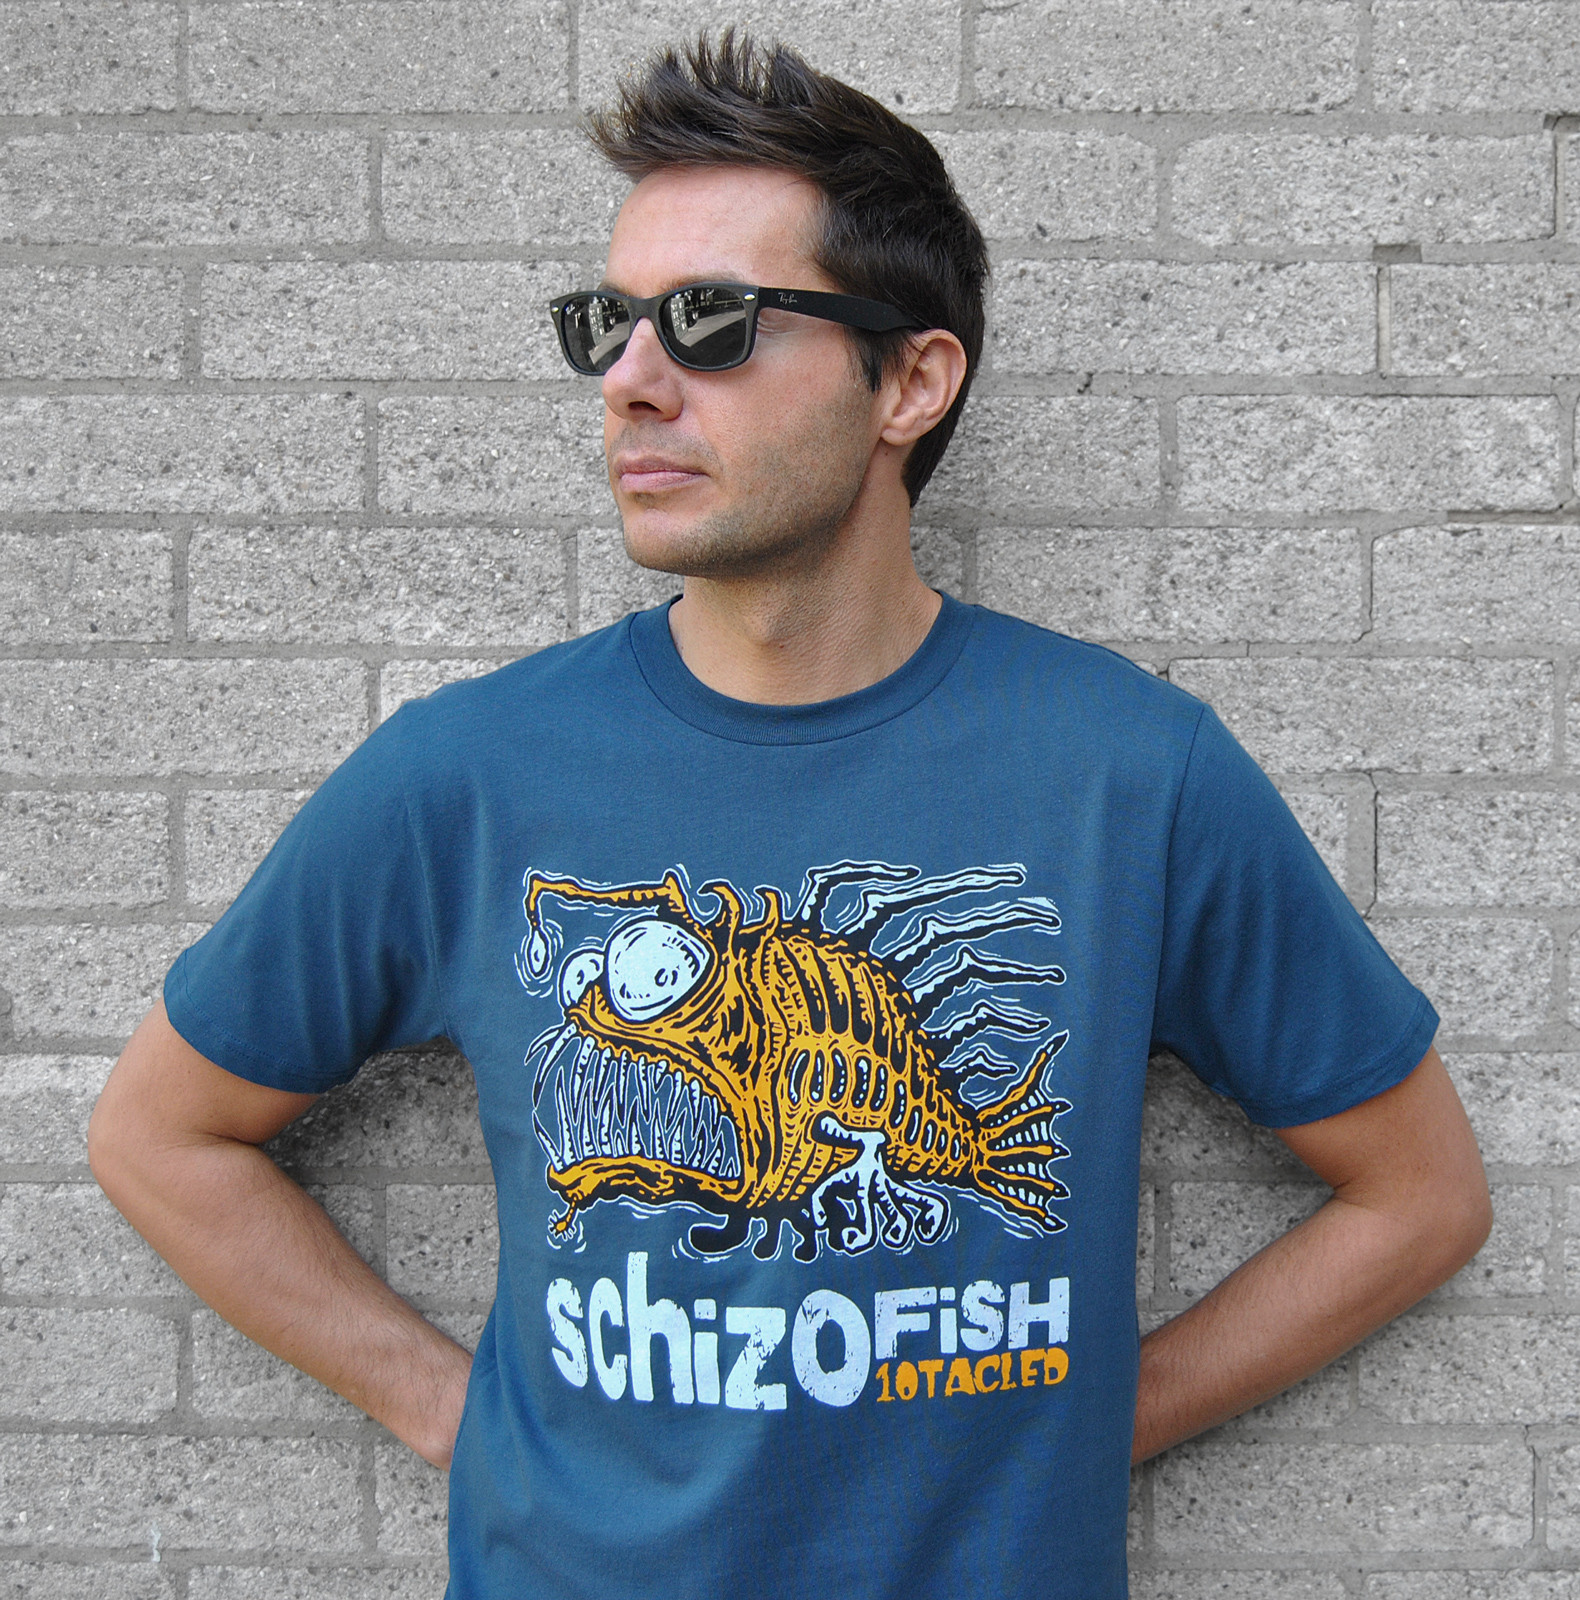 schizofish-tshirt-model-linocut-martin-m